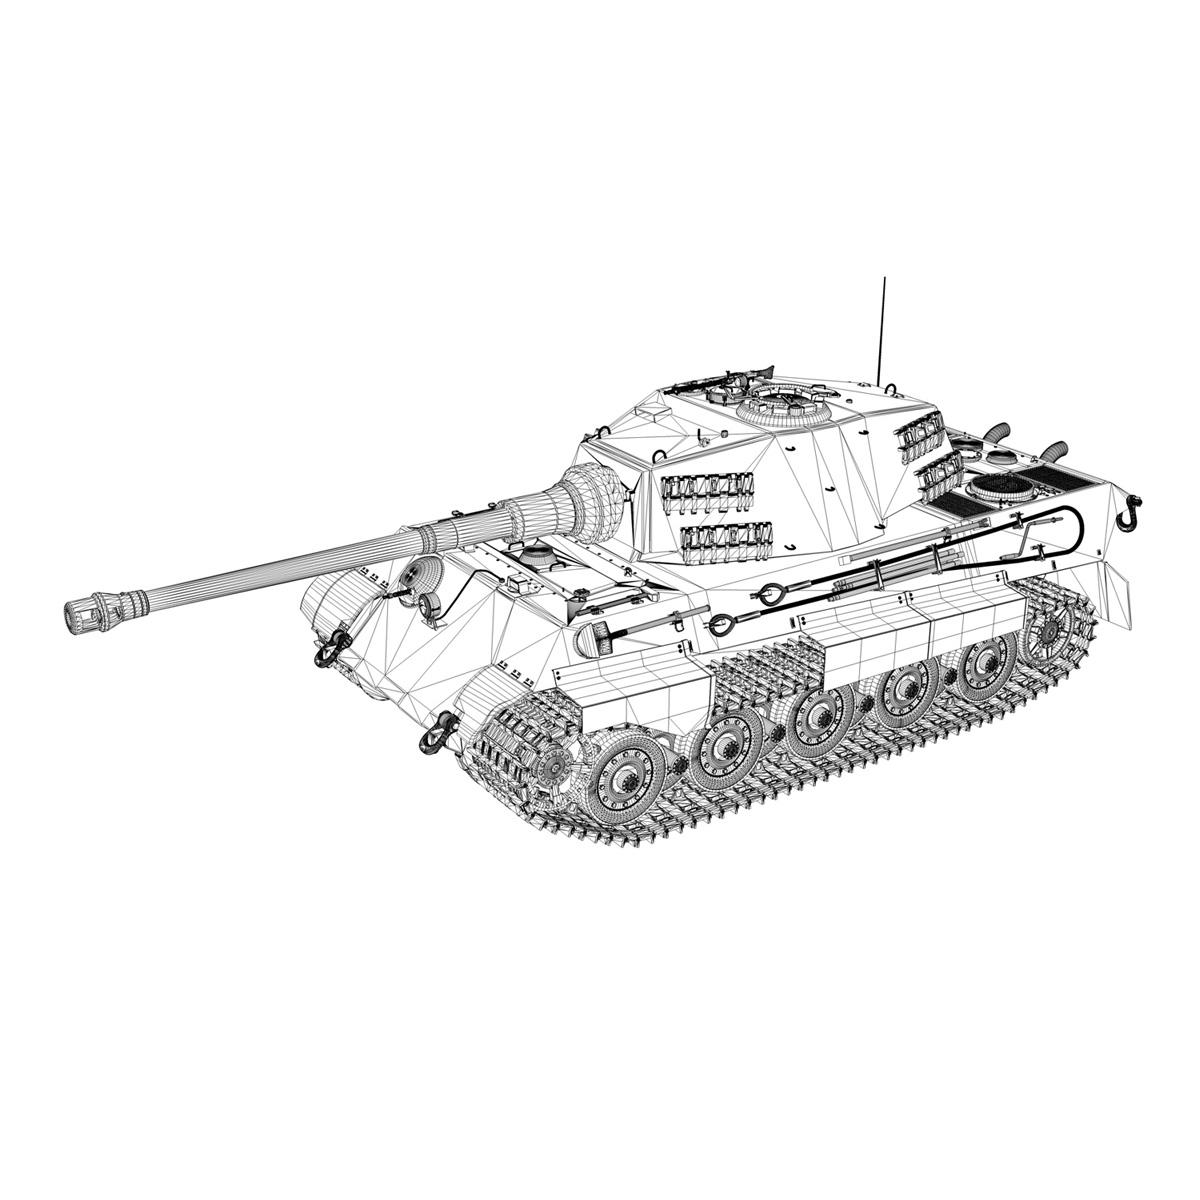 panzerkampfwagen vi – ausf.b – tiger ii – 333 3d model 3ds lwo lw lws obj c4d 265611